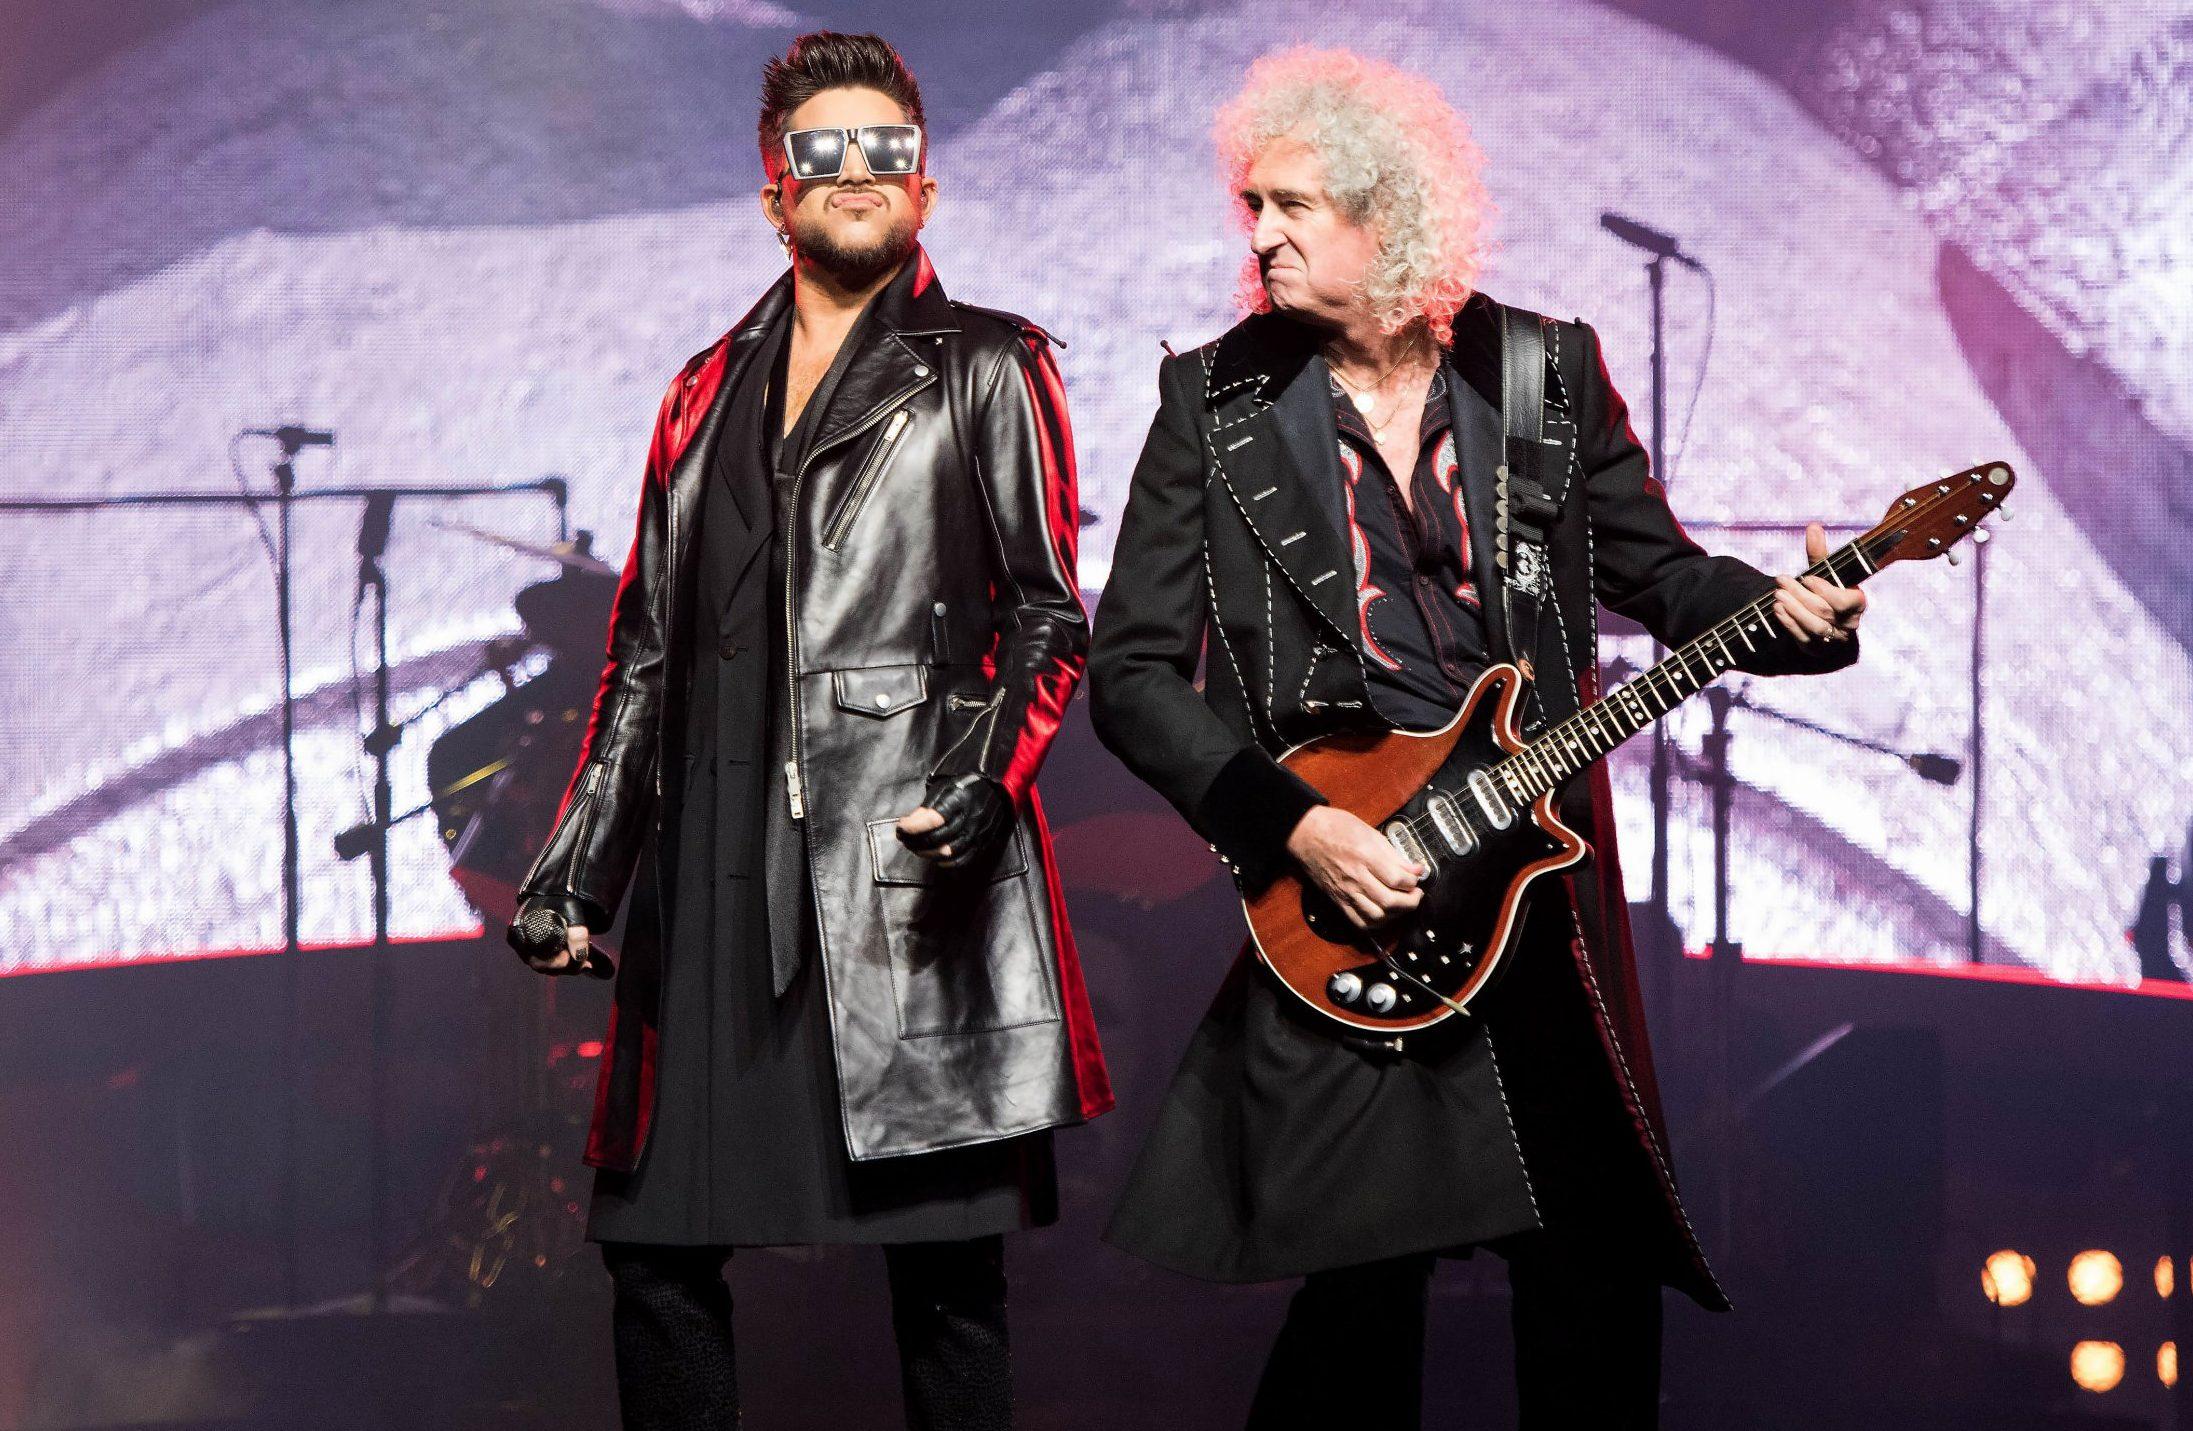 Quen foi Fredi Mercury, o vocalista da lendaria banda Queen